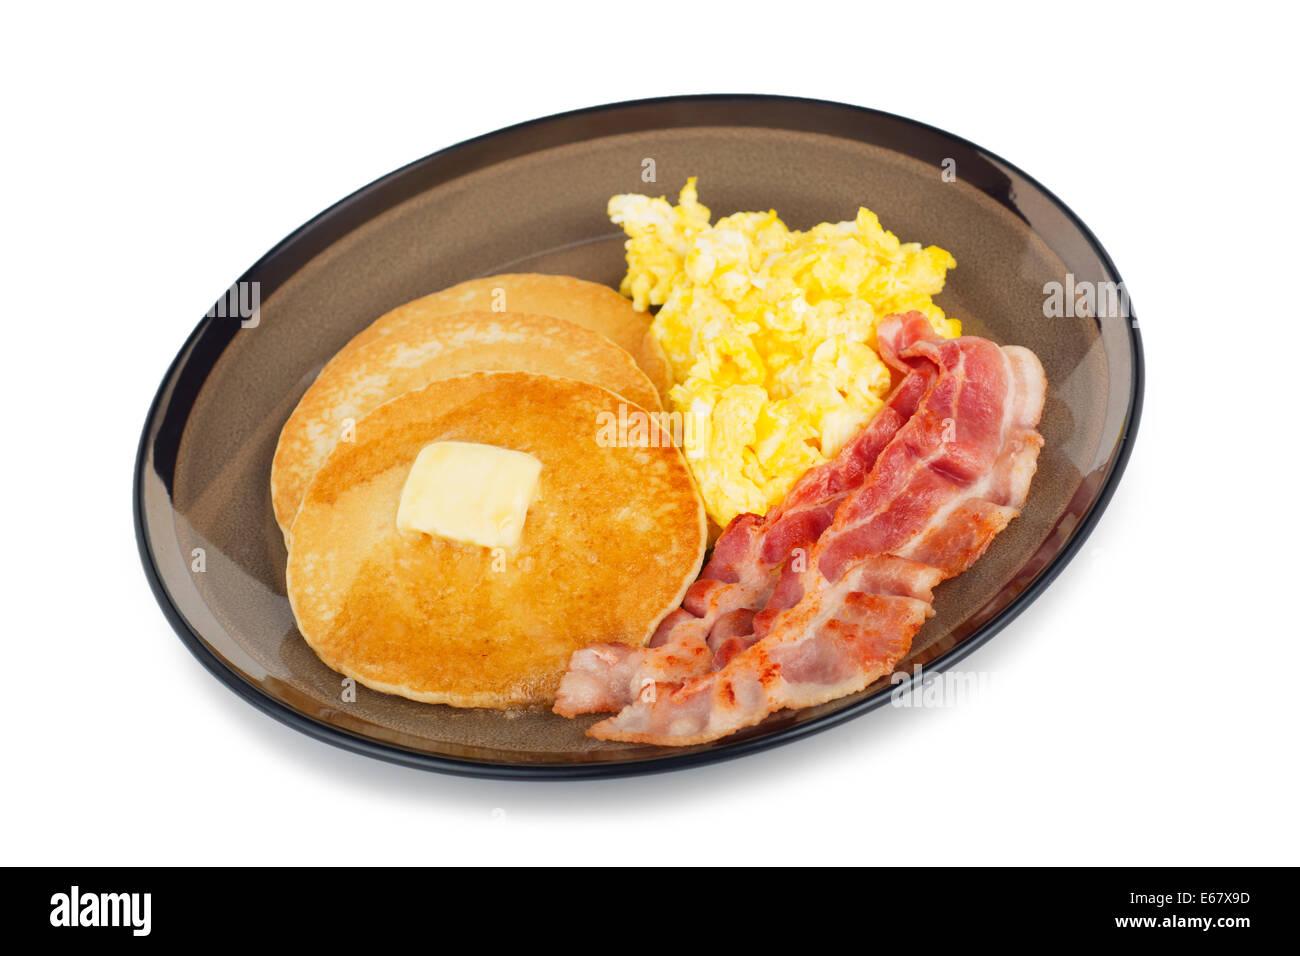 Bacon Eggs Scrambled, Pancakes Pancake Breakfast - Stock Image